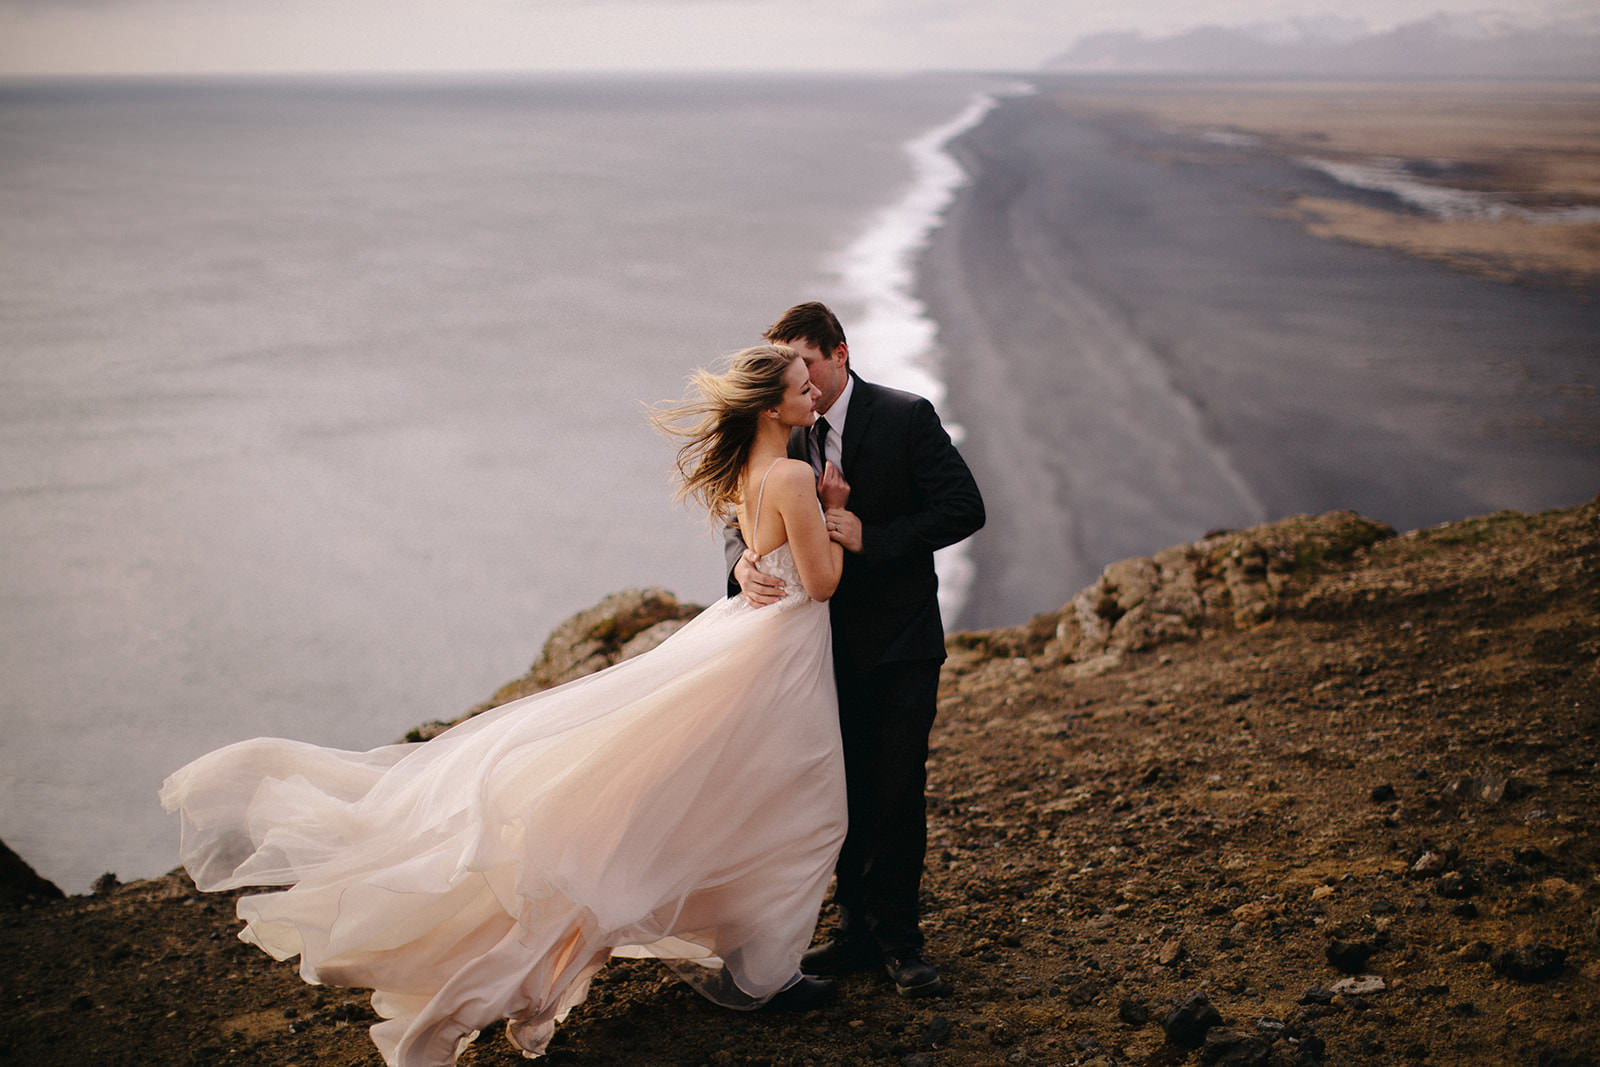 Icelandic Iceland Elopement Wedding Elope Photographer Eloping Reykjavík Vik Black Sand Beach Jökulsárlón Skogafoss Waterfall Vestrahorn Mountain Liz Osban Photography Destination 82.jpg